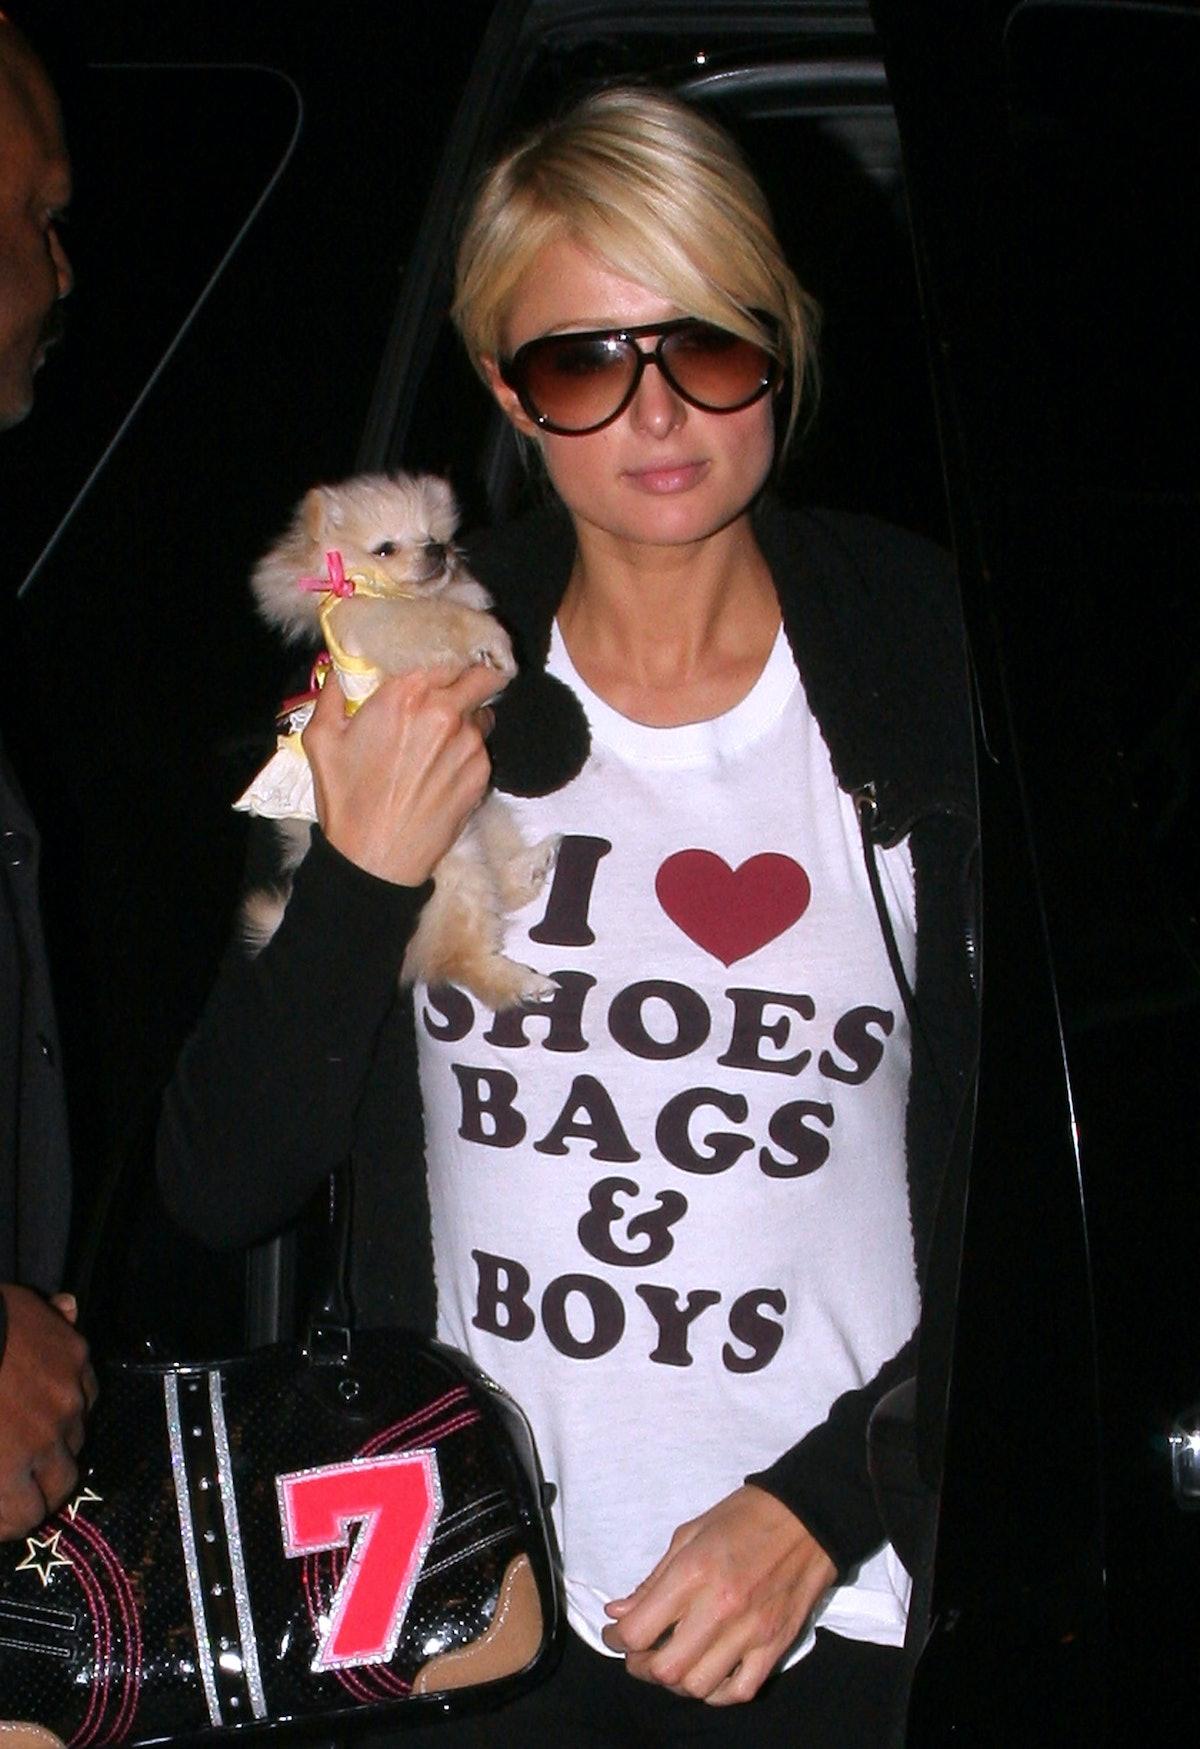 Paris holding a small dog